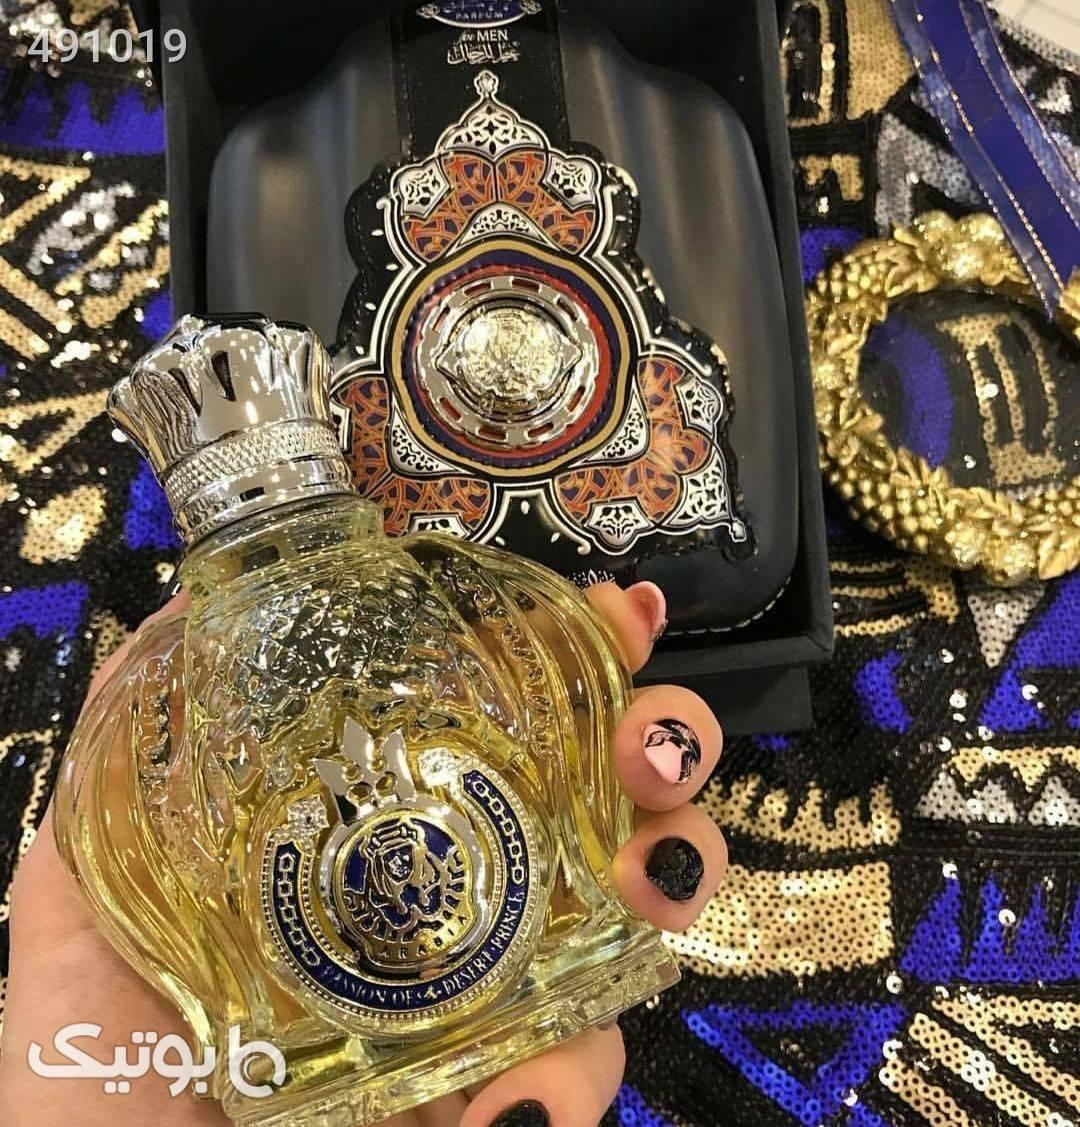 ادکلن سلطنتی شیخ 77 زرد عطر و ادکلن